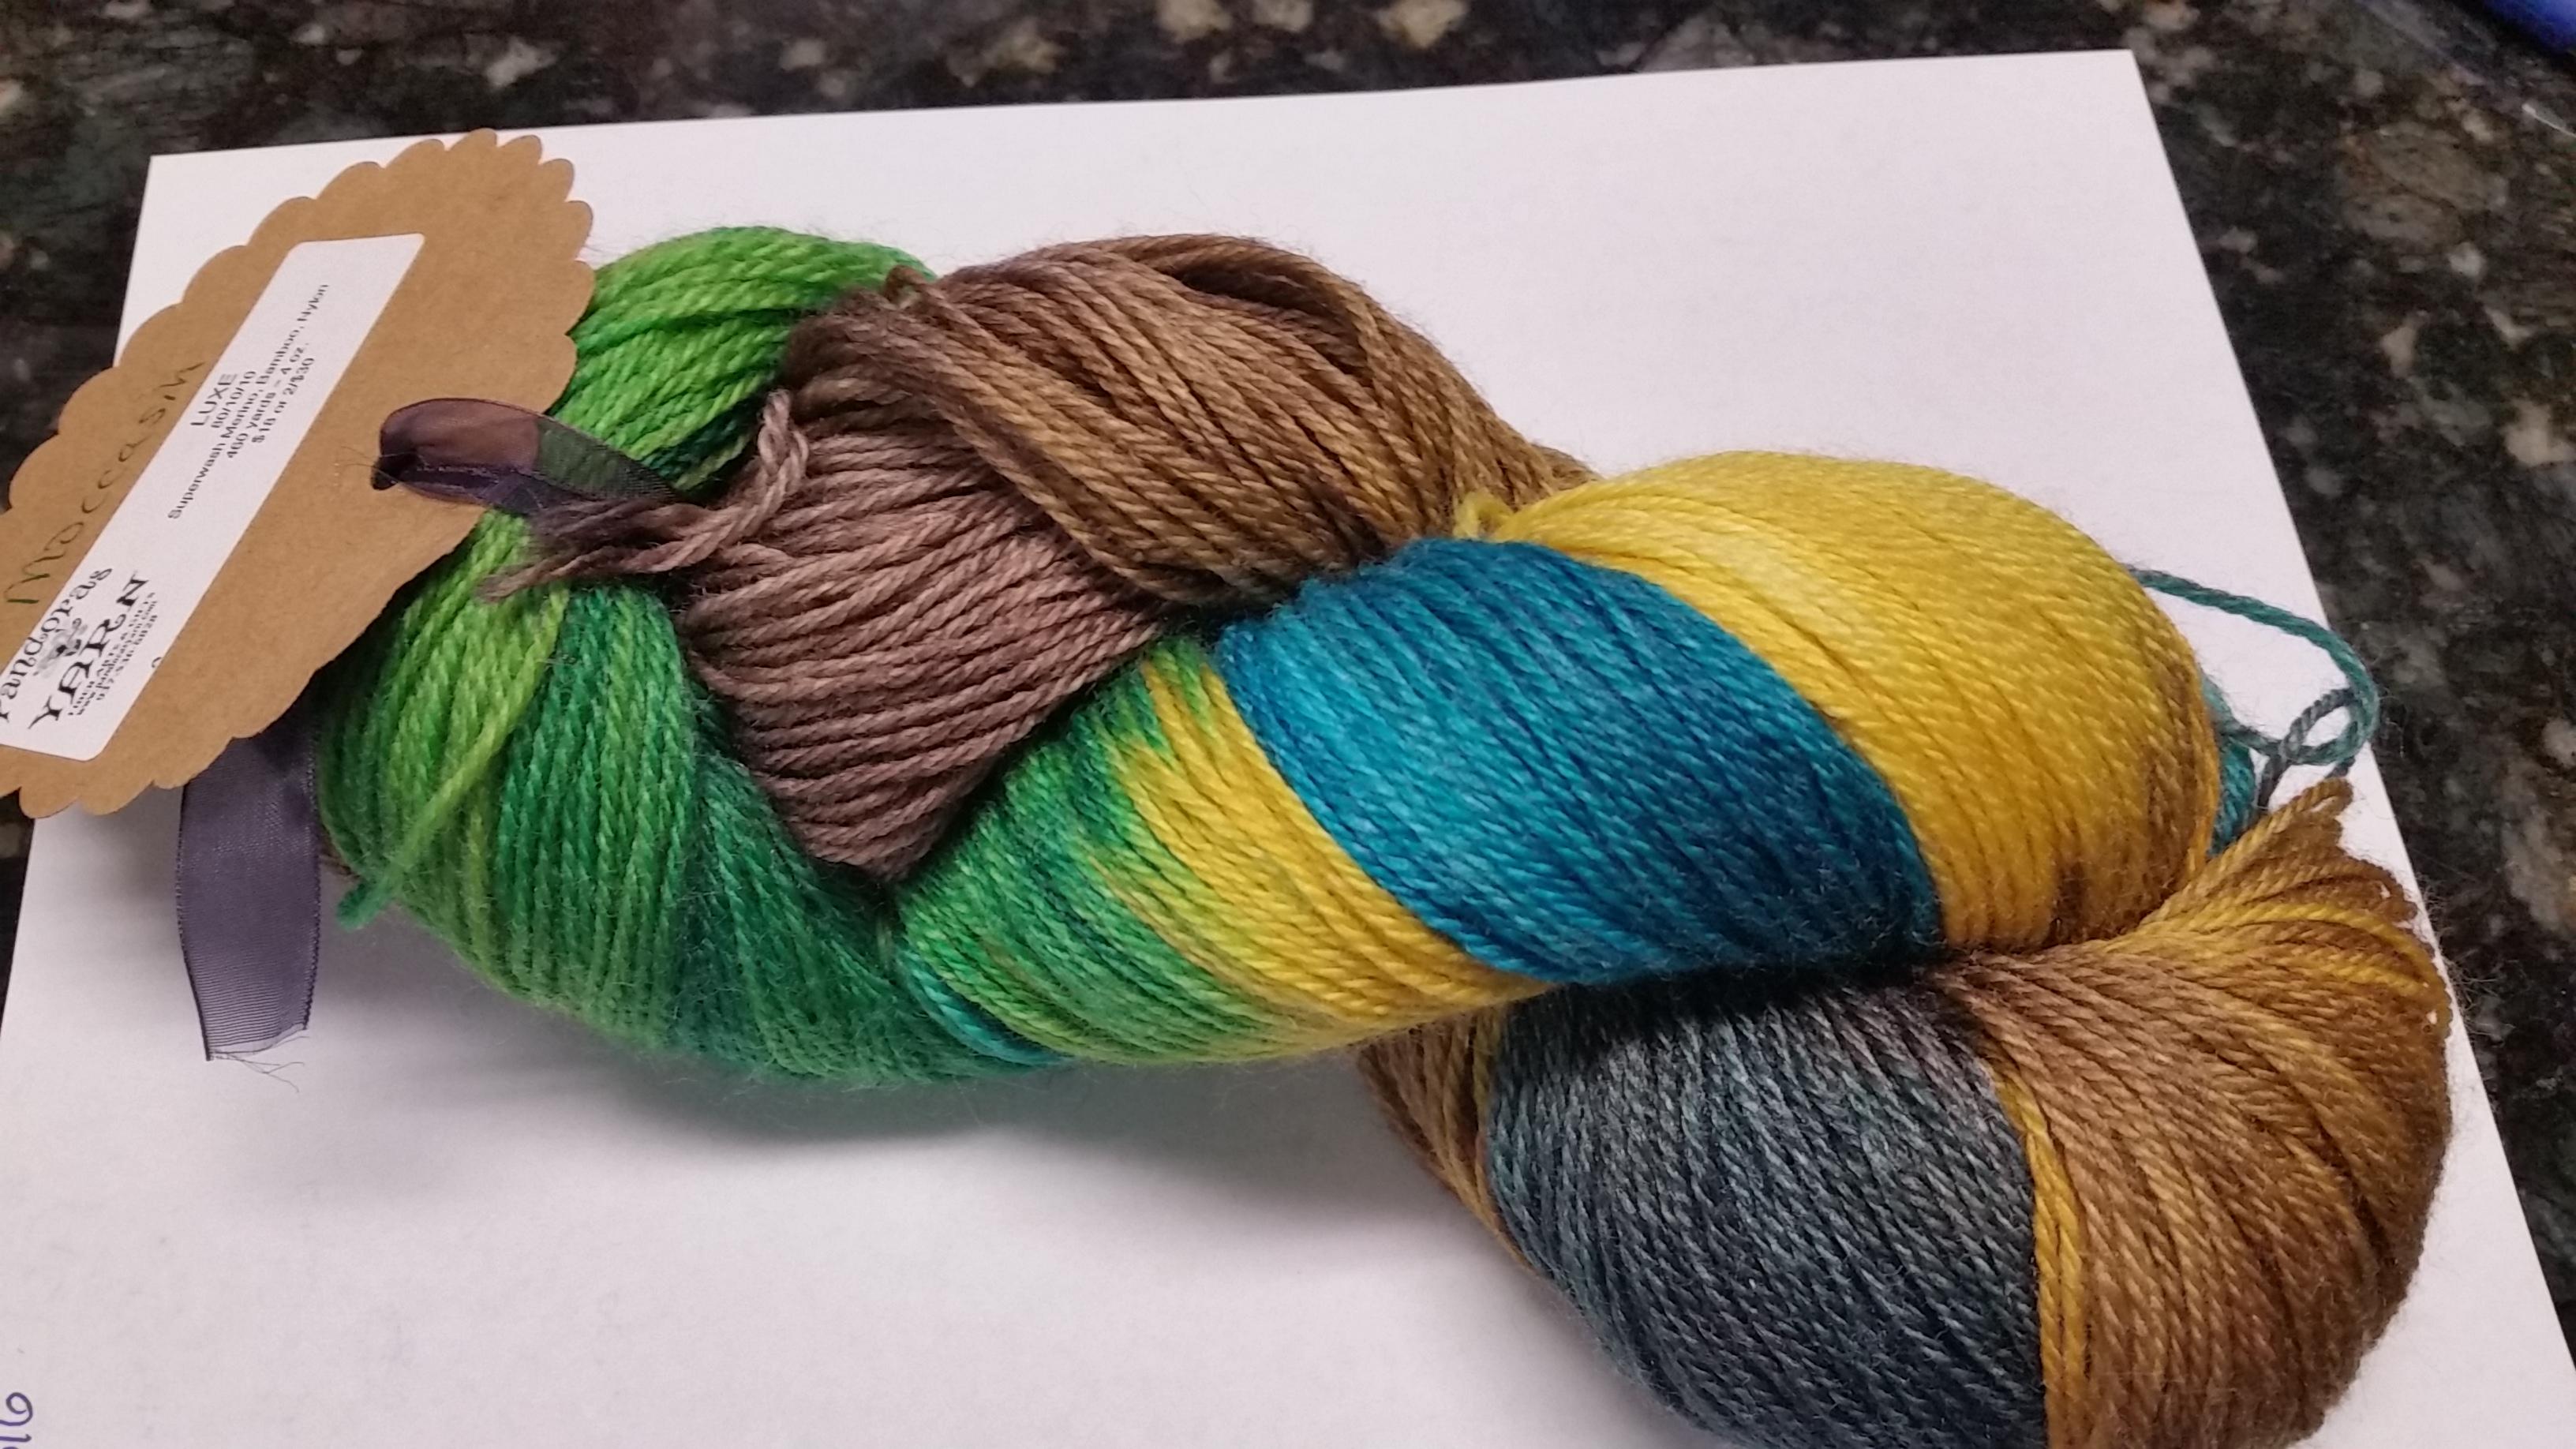 Pandora's Yarn Luxe sock yarn in Moccasin